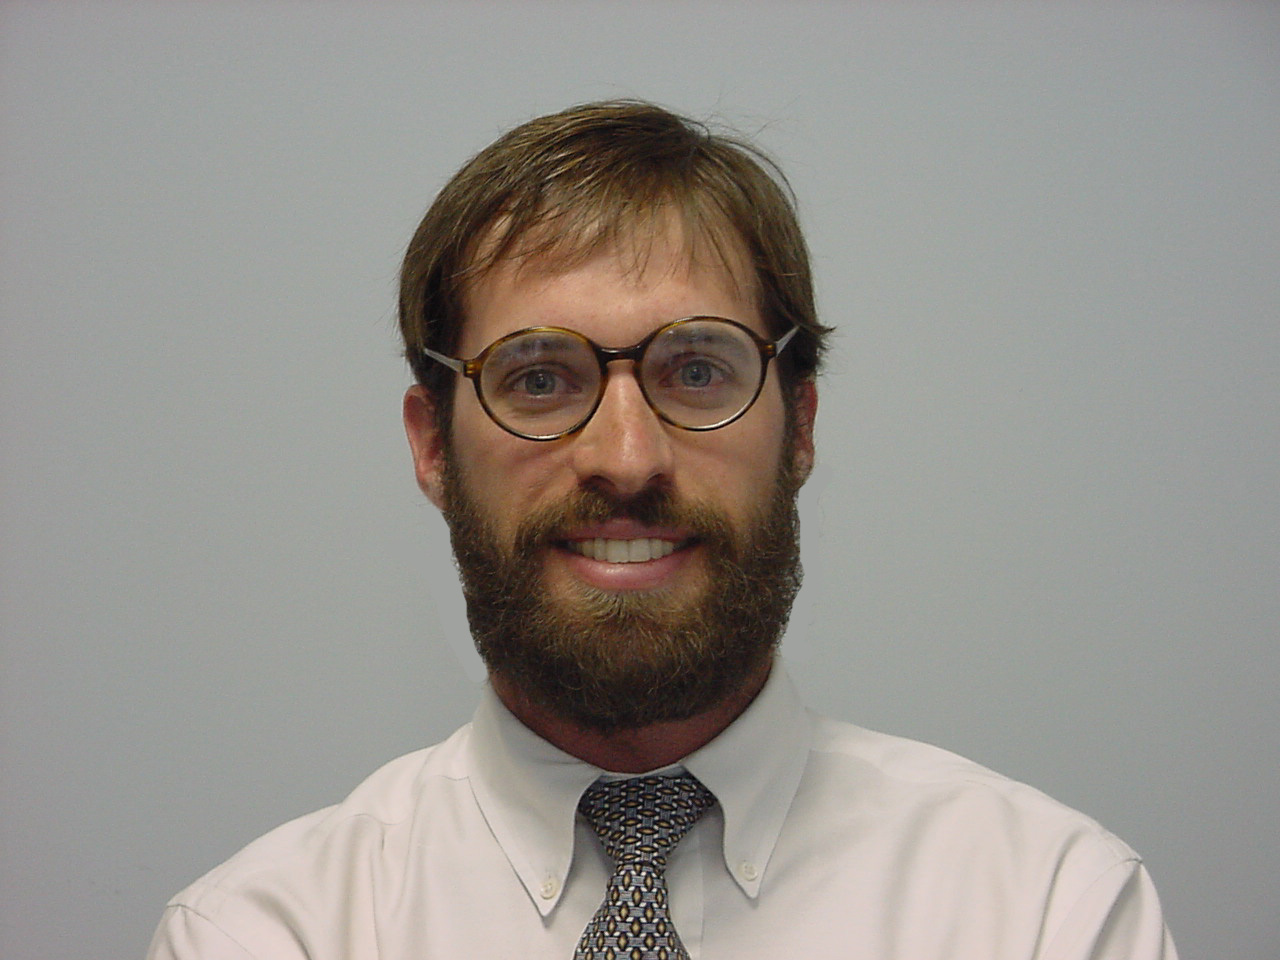 Andrew Hoofnagle